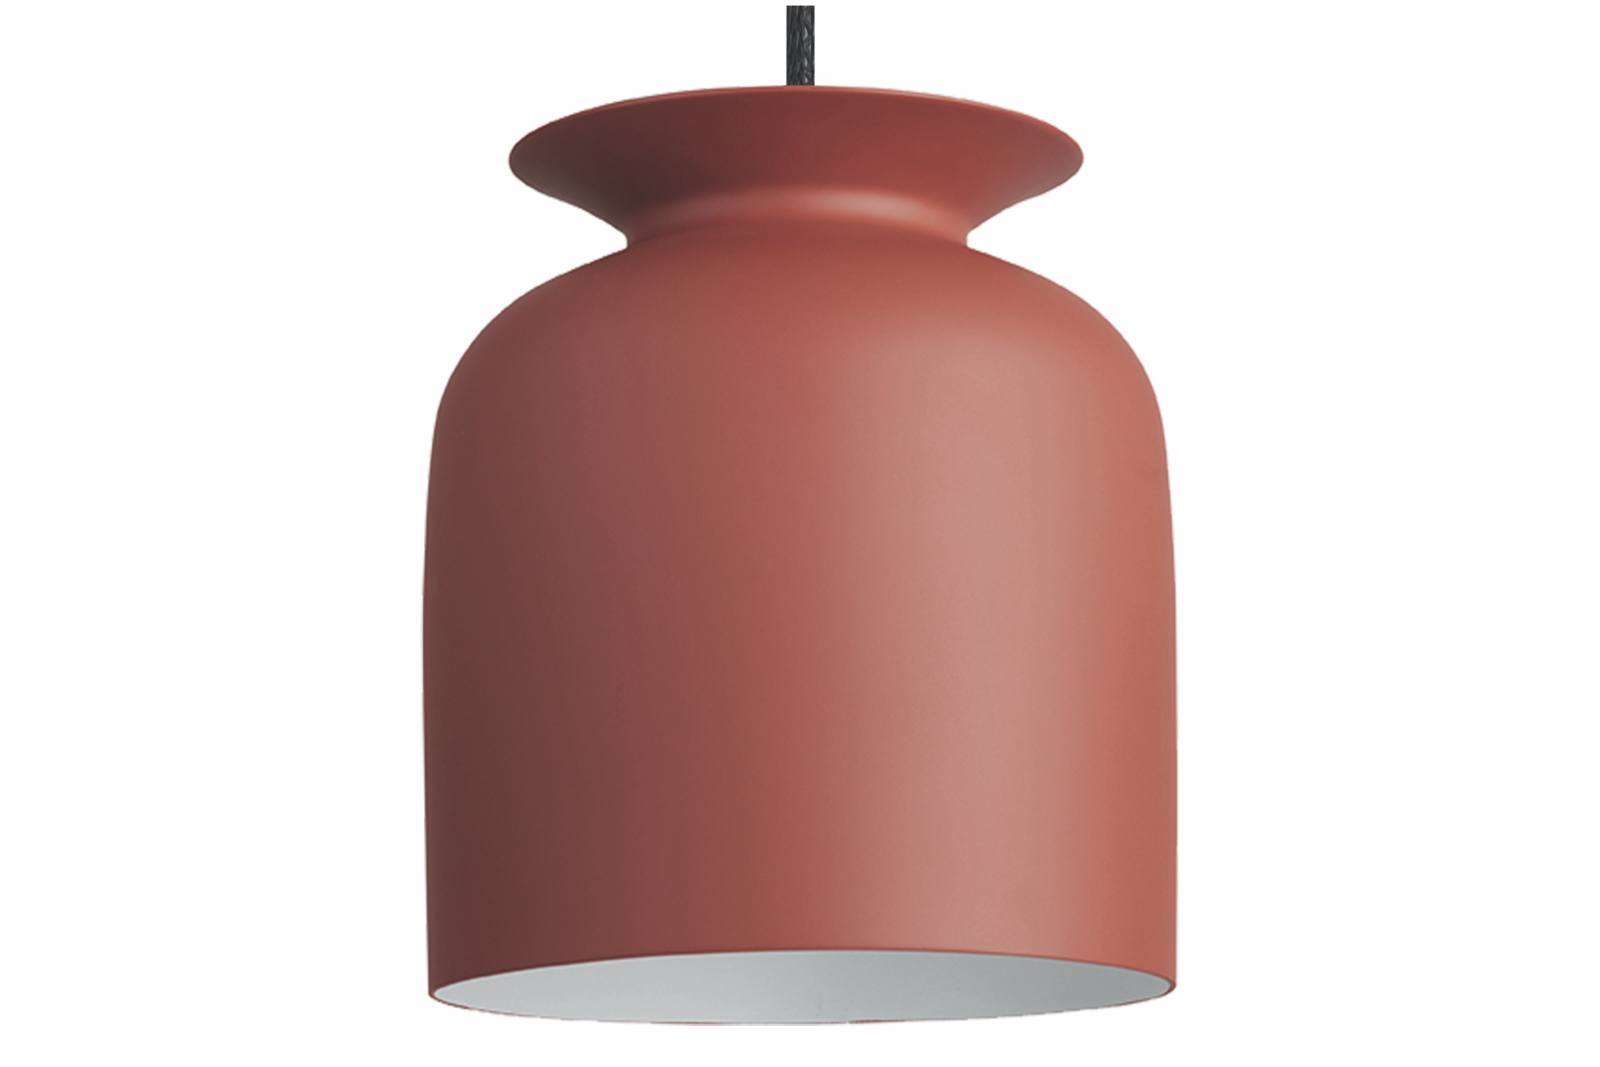 Ronde Pendant Light Gubi Metal Rusty Red, 020